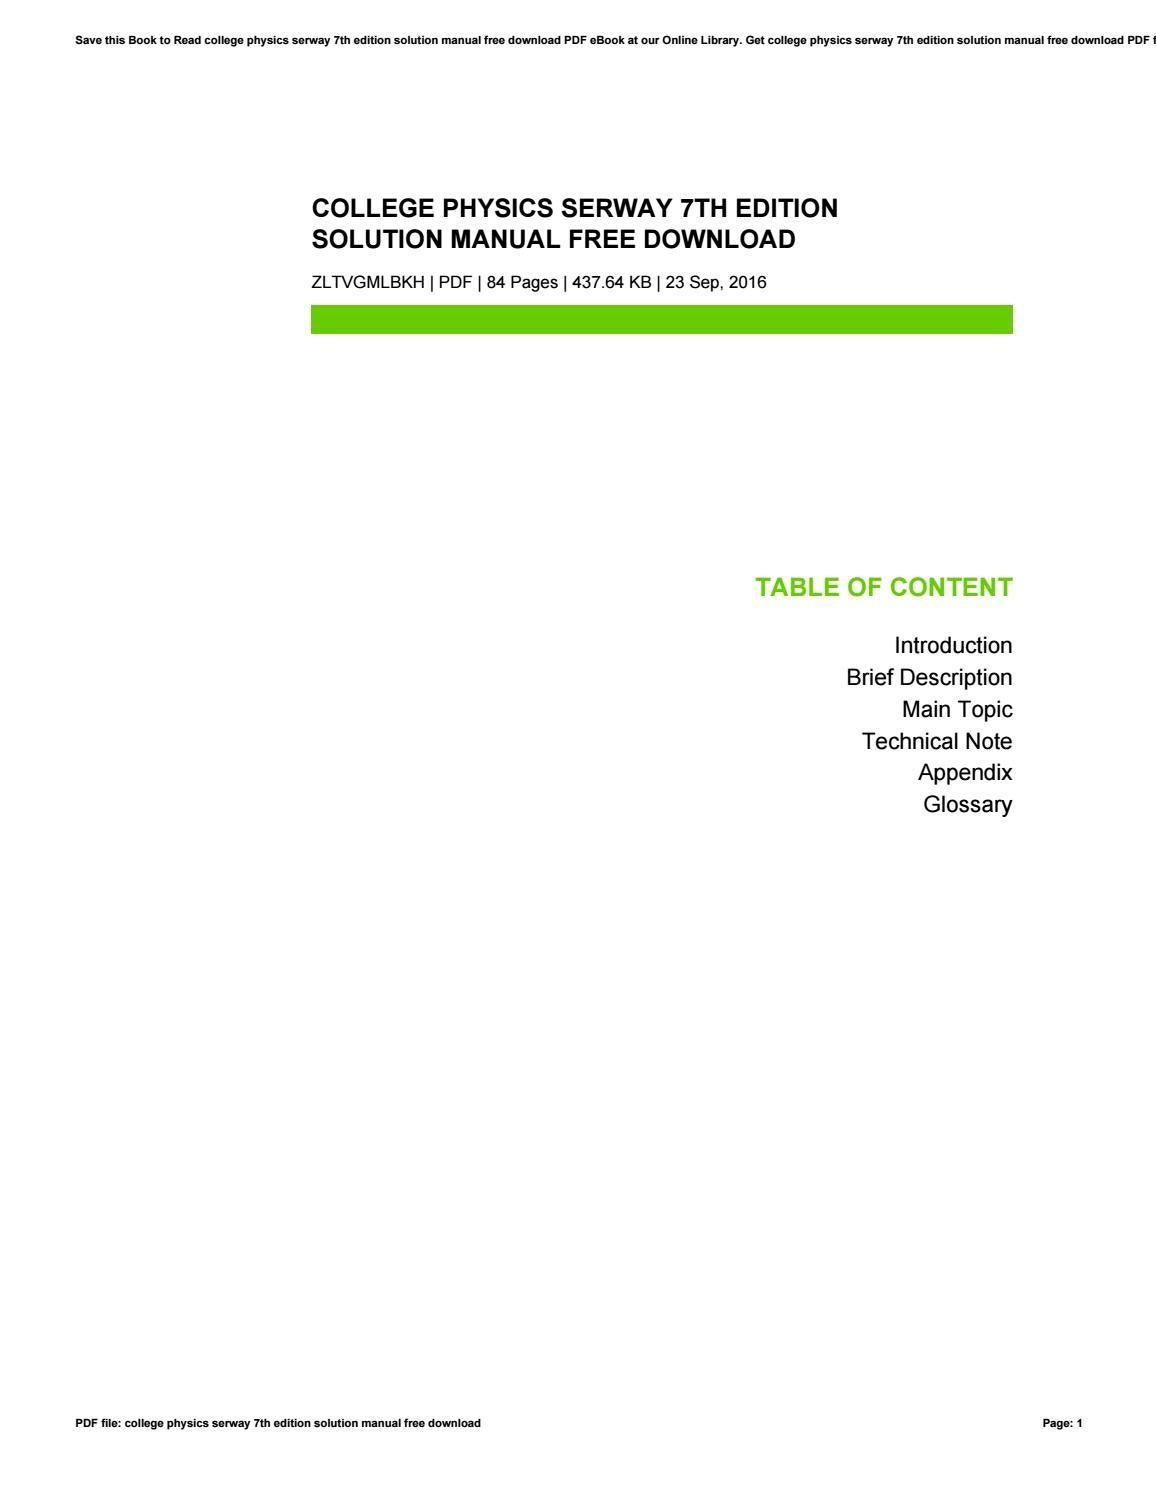 elementary linear algebra applications version 11th edition solutions pdf